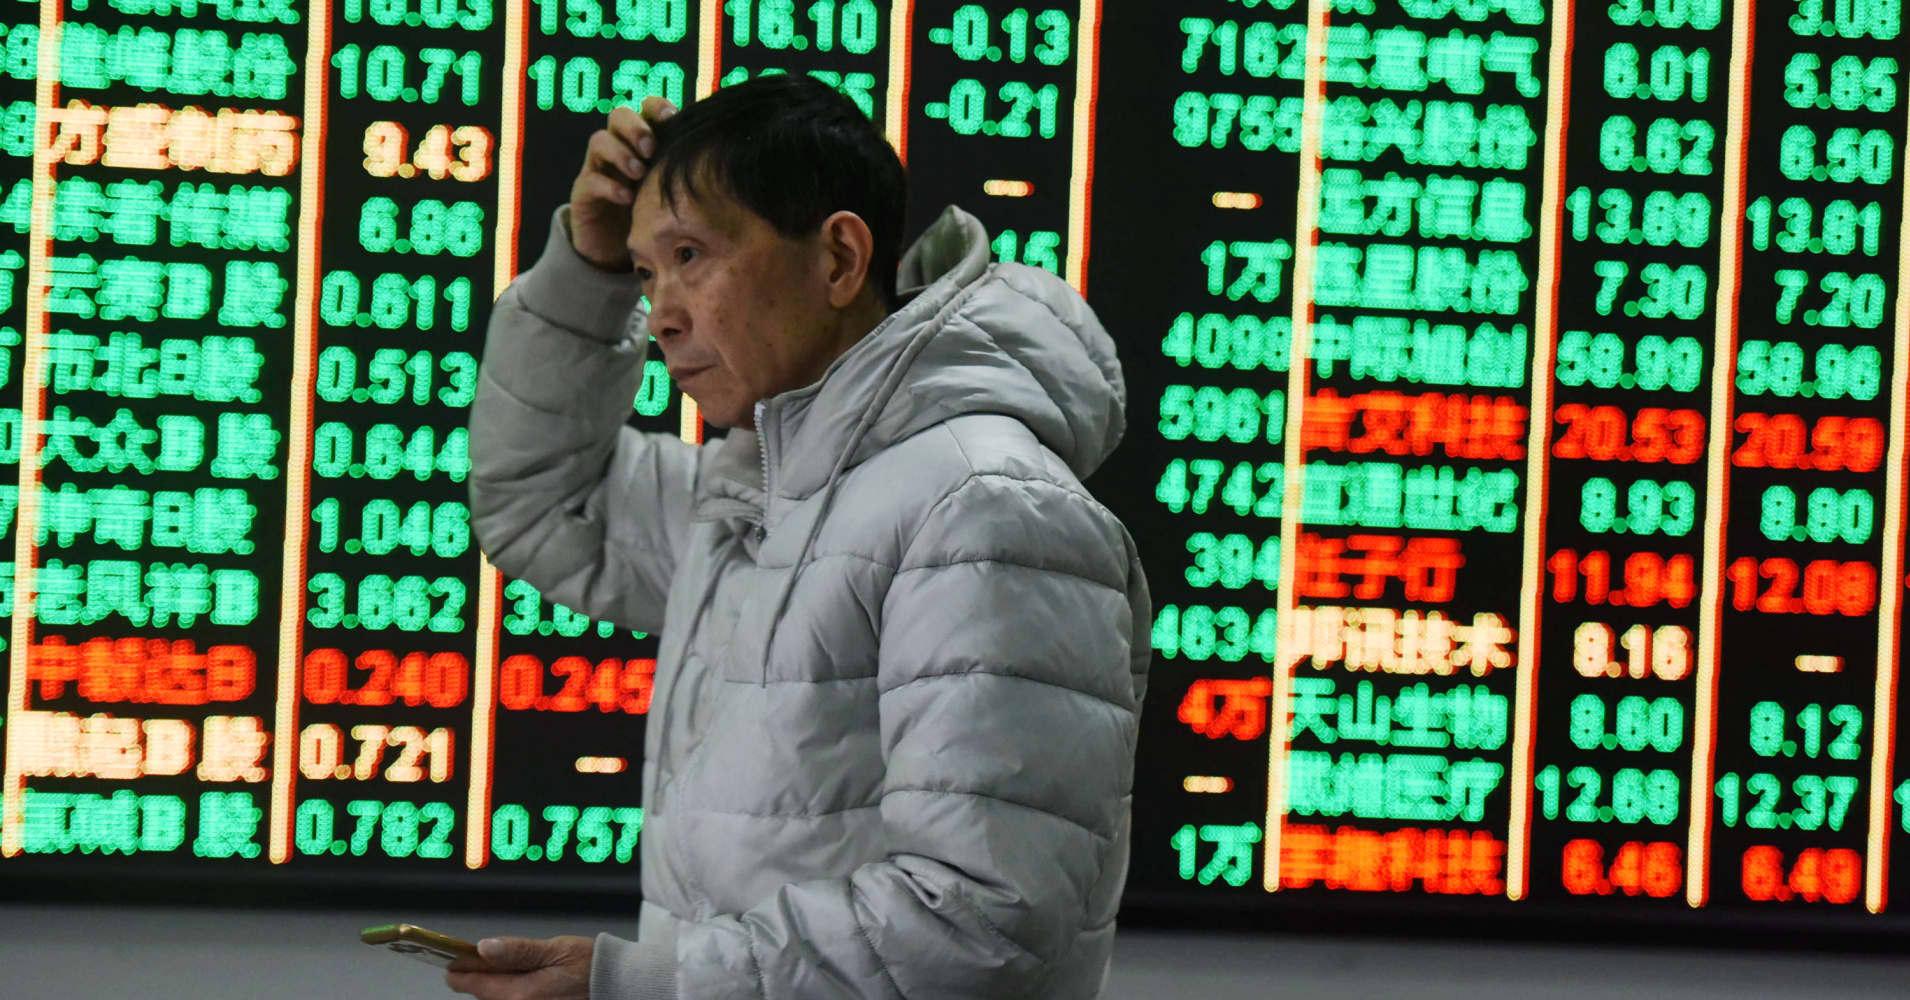 China stocks: Shanghai and Shenzhen markets fall